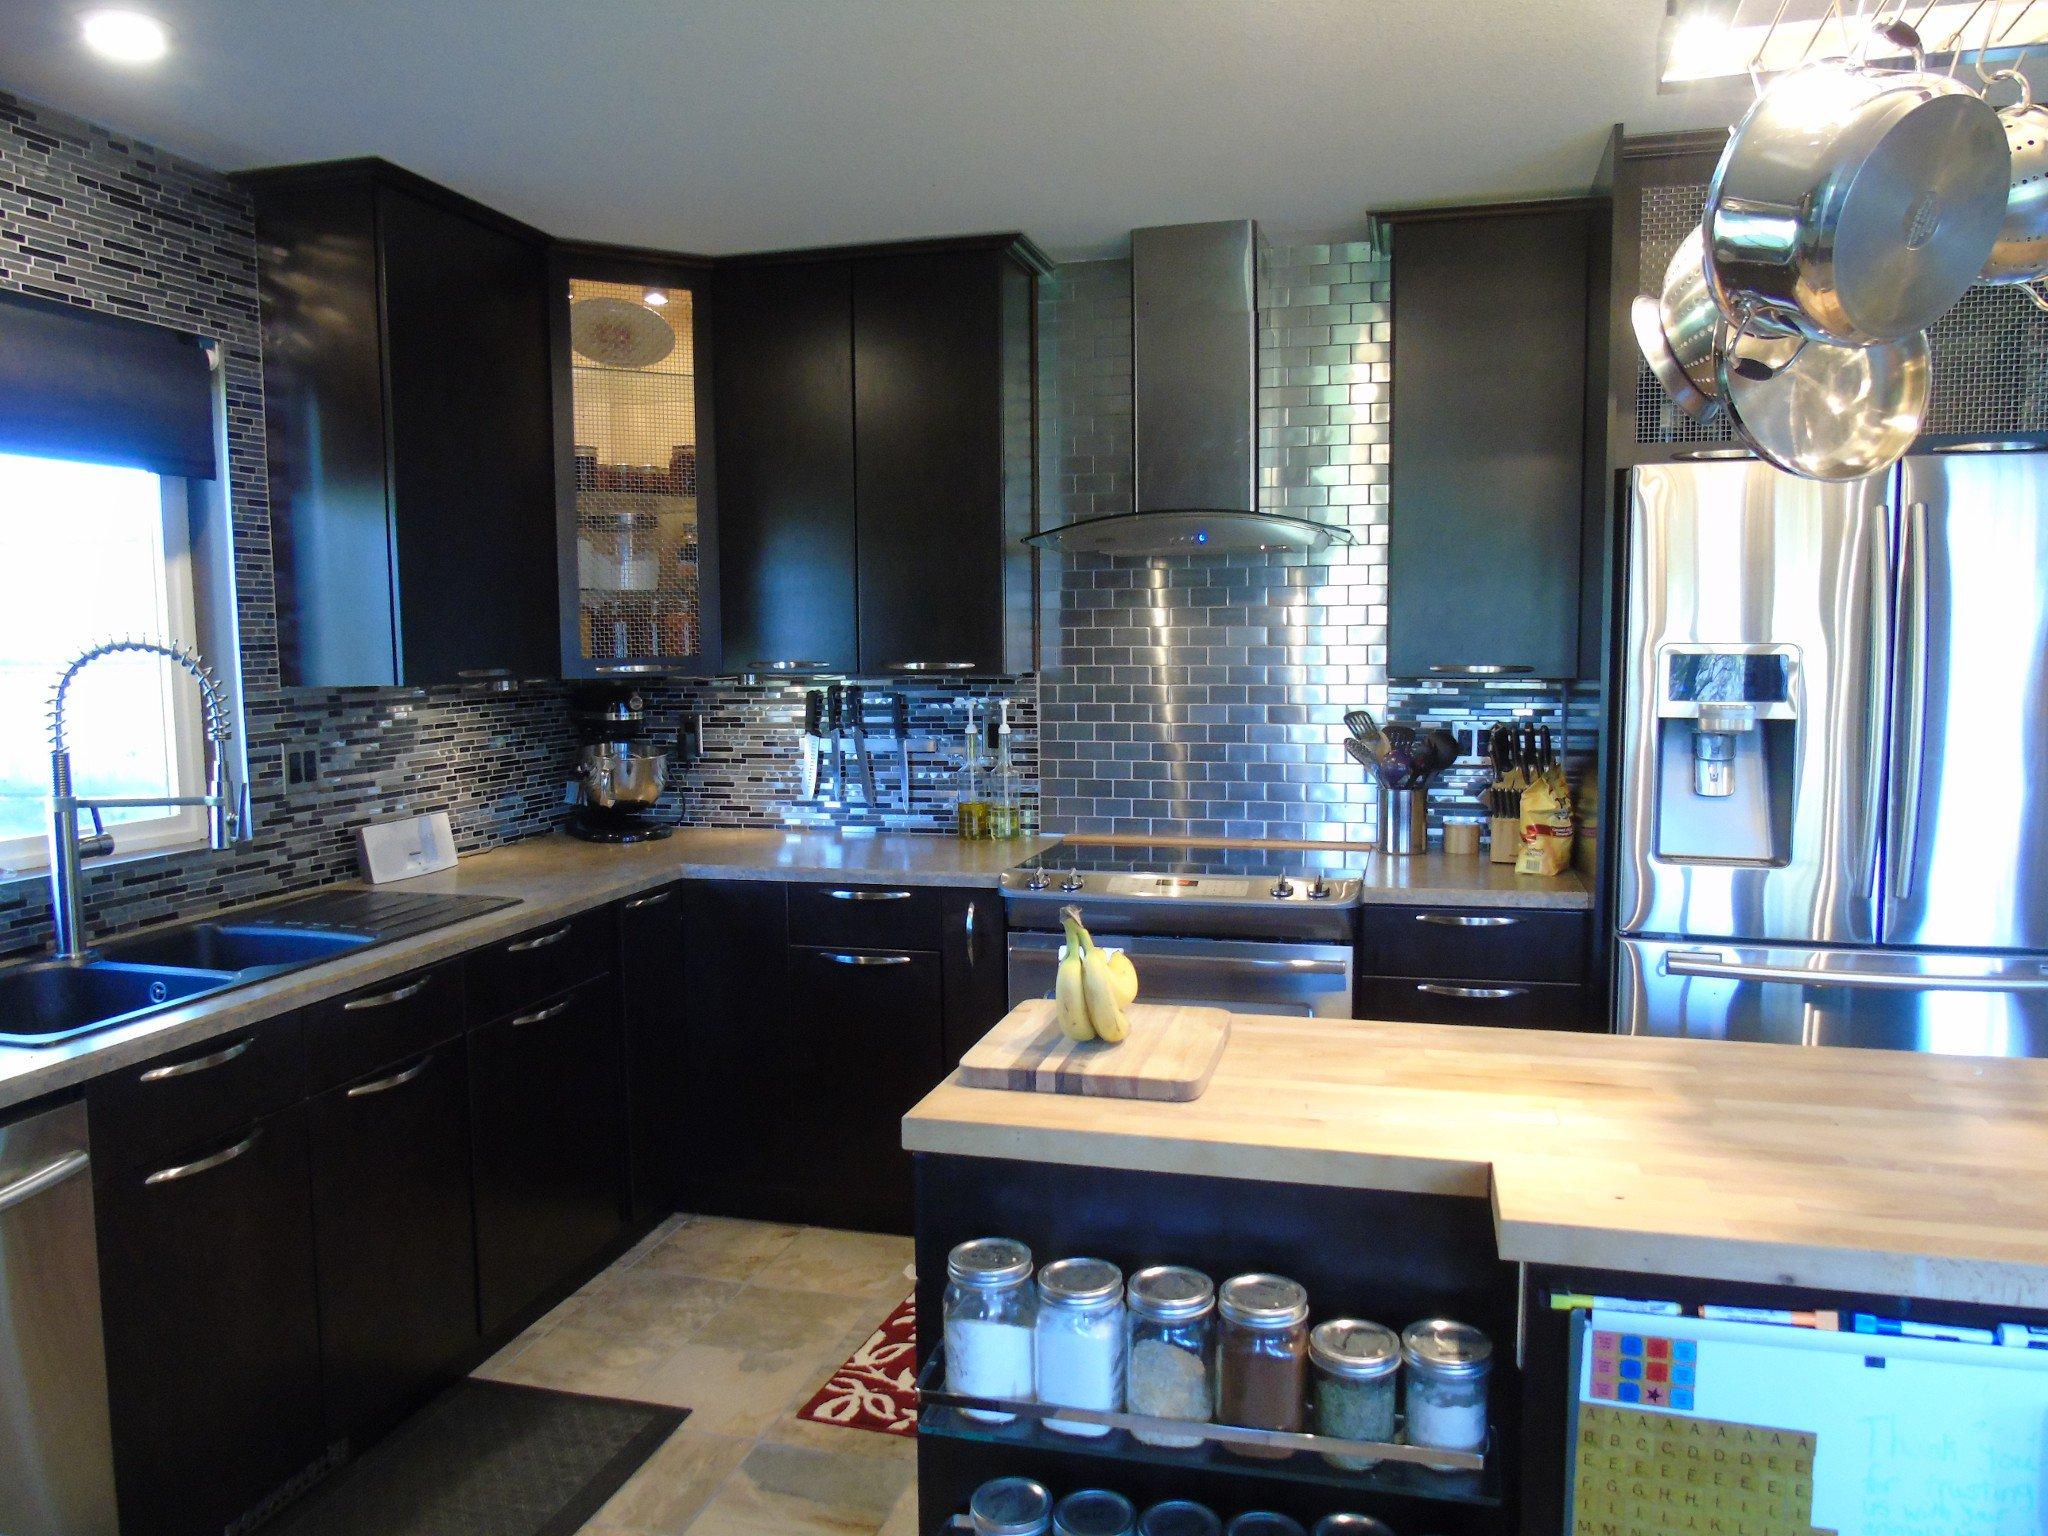 Photo 5: Photos: 6490 Barnhartvale Road in Kamloops: Barnhartvale House for sale : MLS®# New